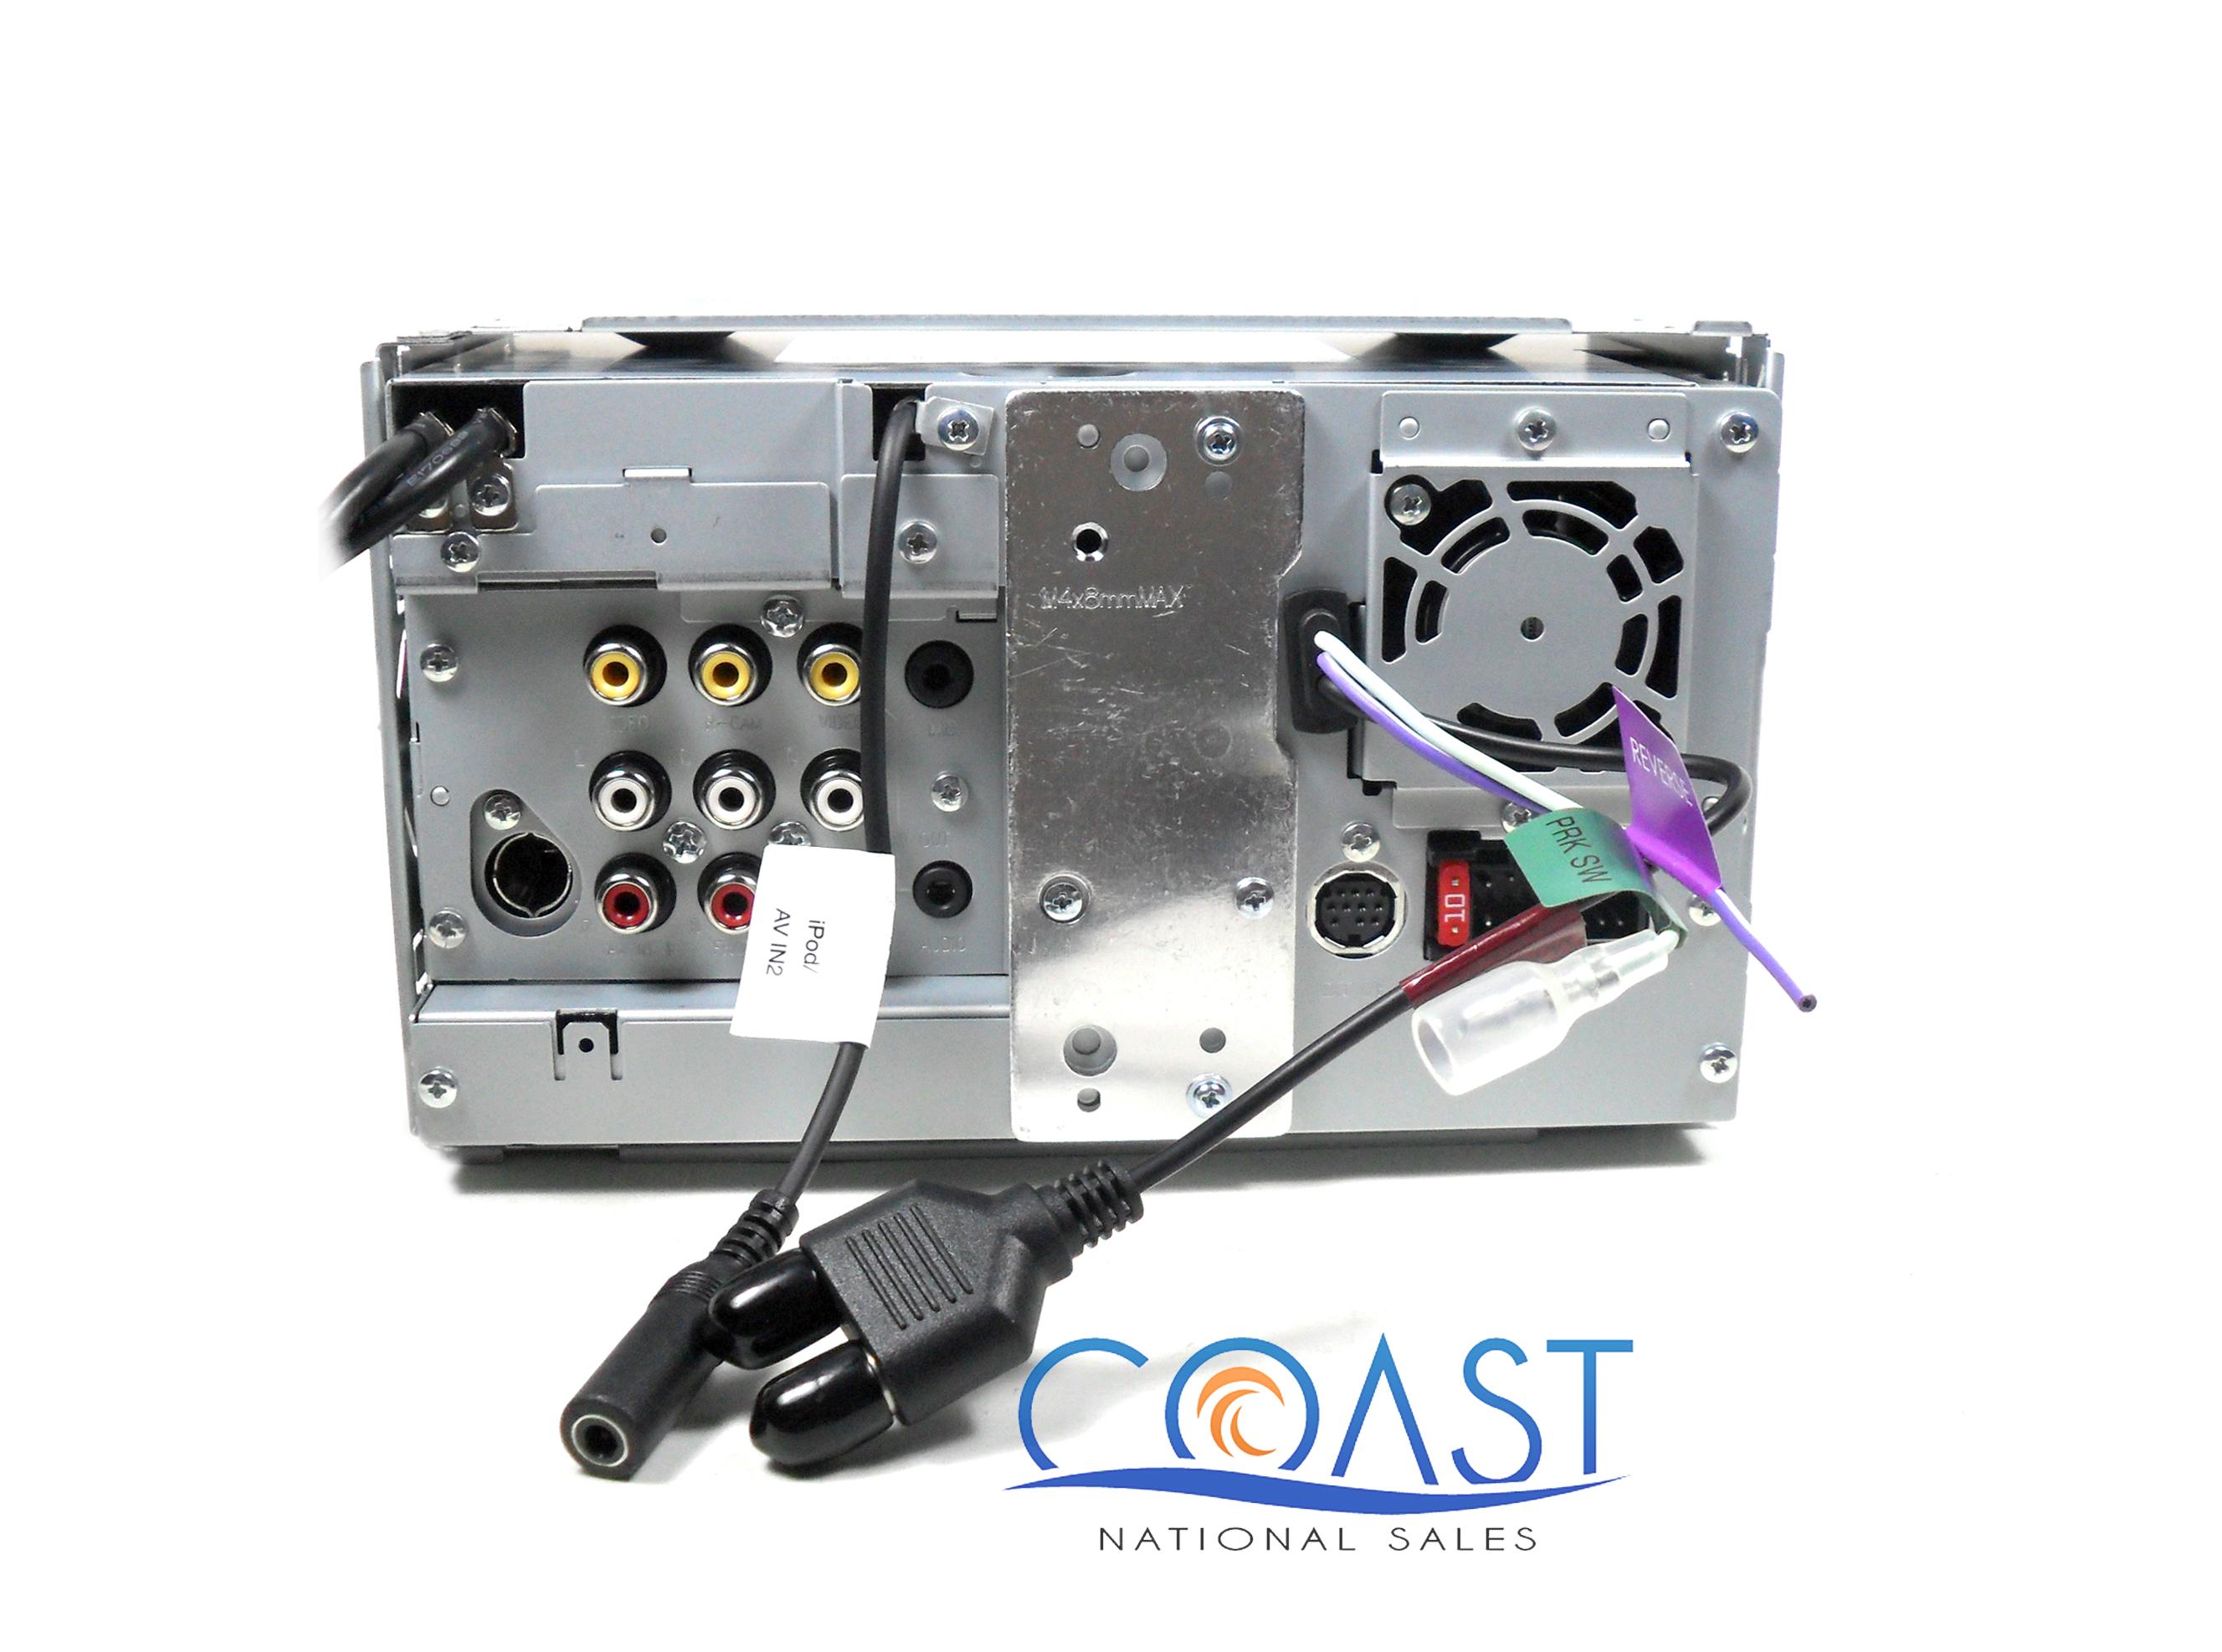 wiring diagram kenwood ddx 470 kenwood ddx470 double din